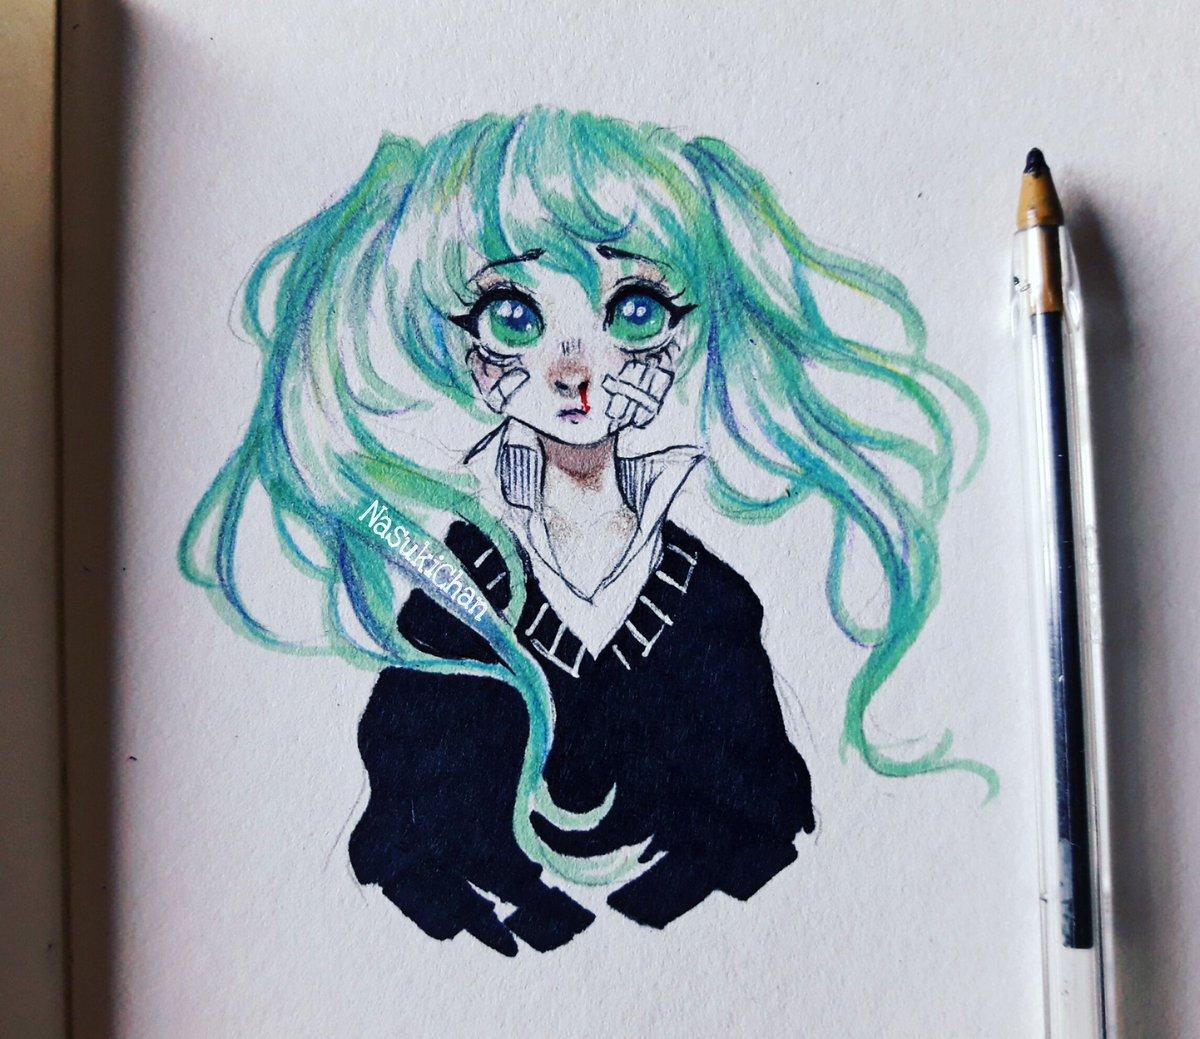 Rolling girl. #myart #drawing <br>http://pic.twitter.com/TcJc9PZfk3